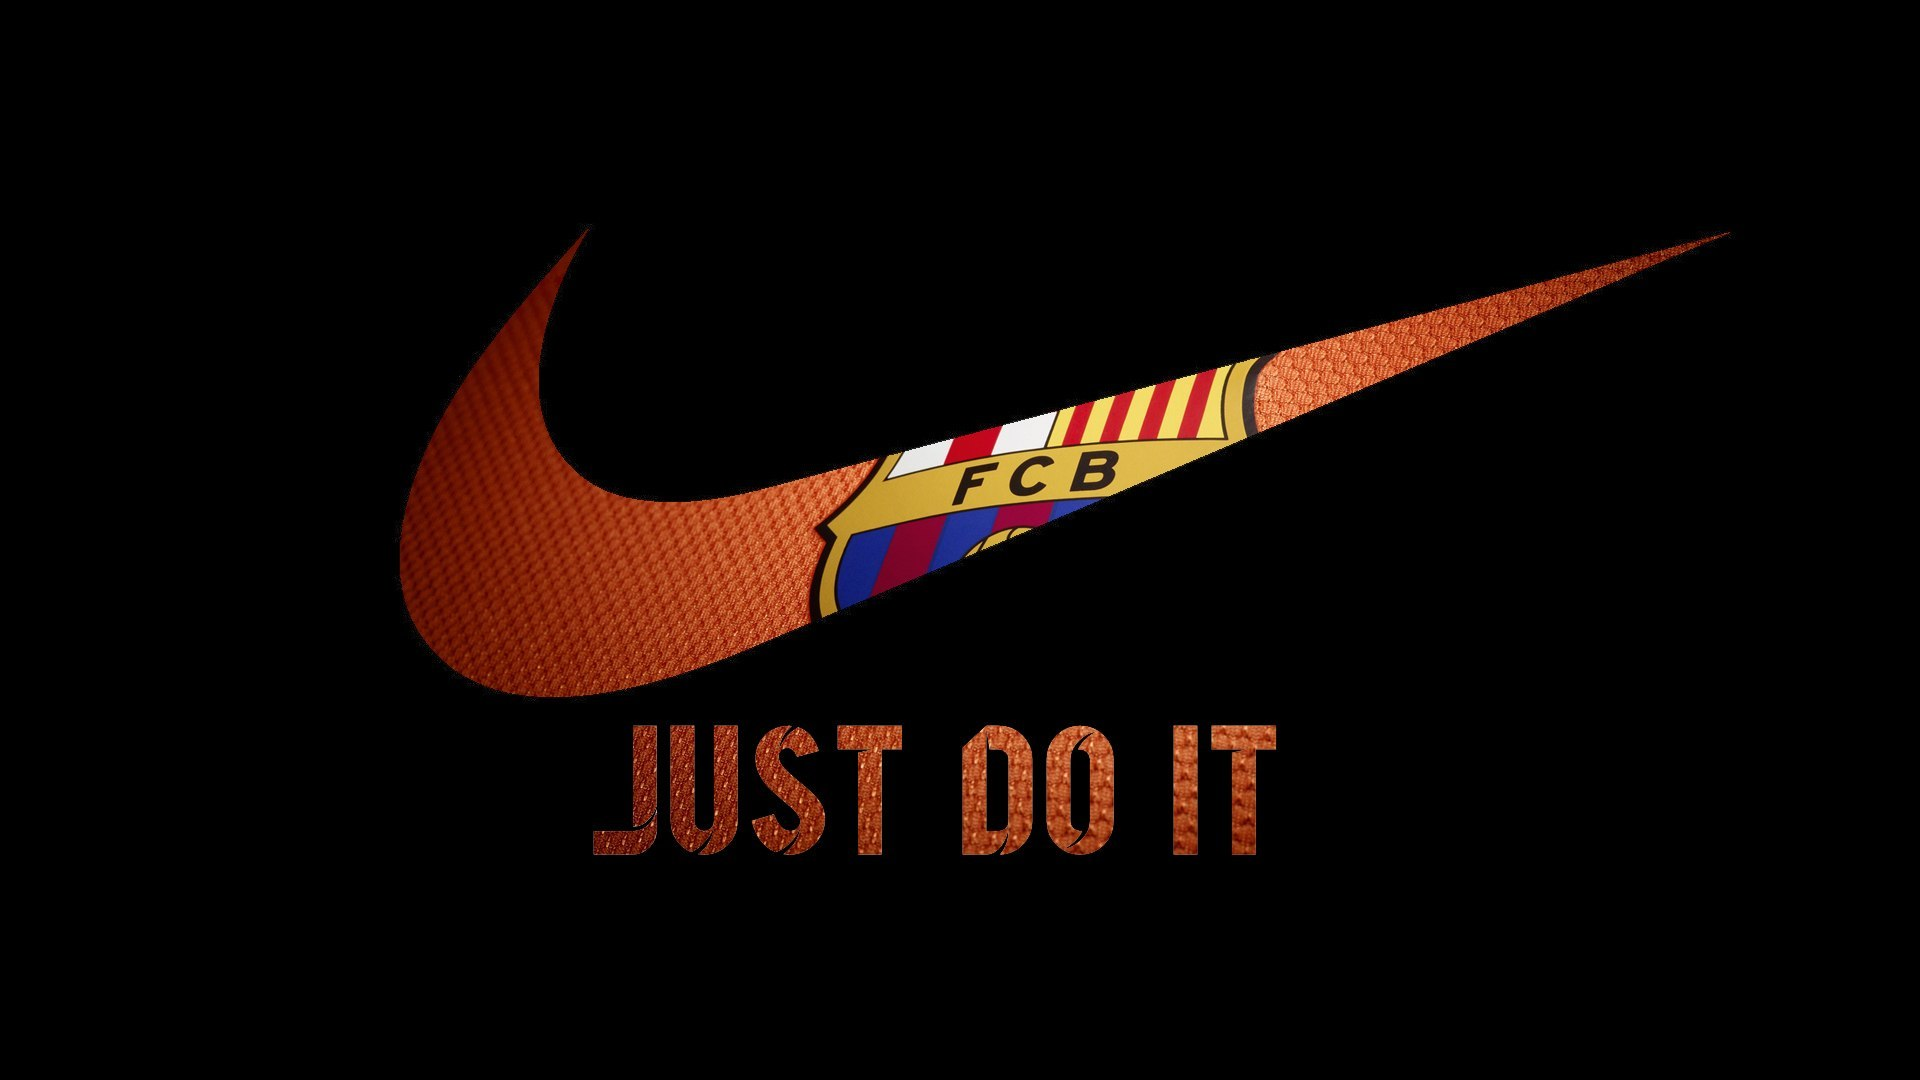 Cute Birds Wallpapers For Desktop Nike Fcb Logo Hd Logo 4k Wallpapers Images Backgrounds